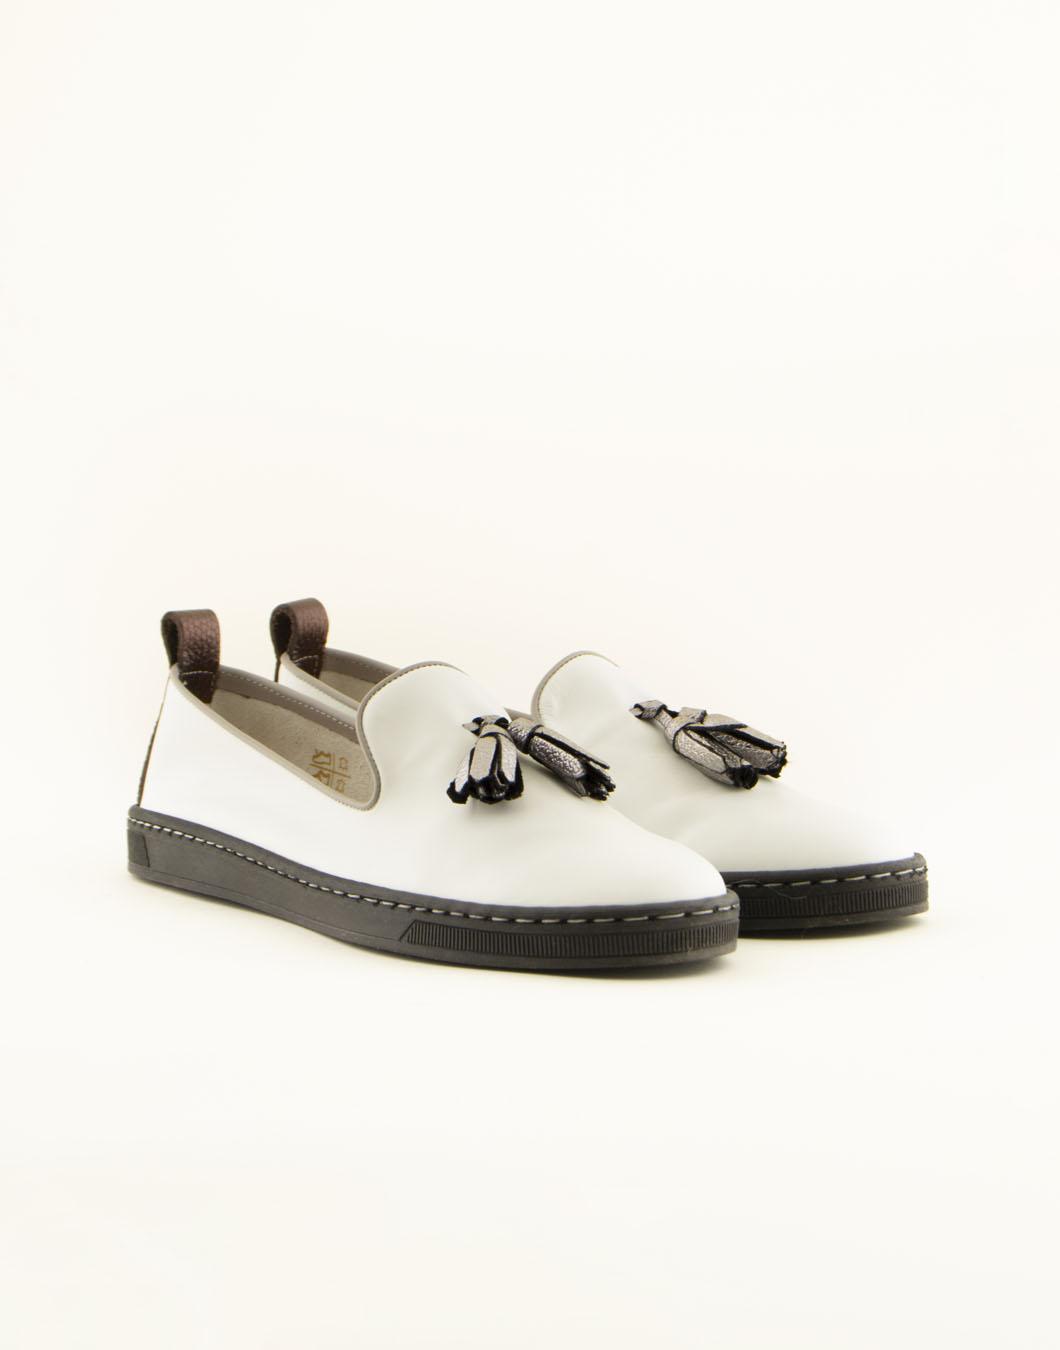 Sneakers in pelle - MAURO LEONE